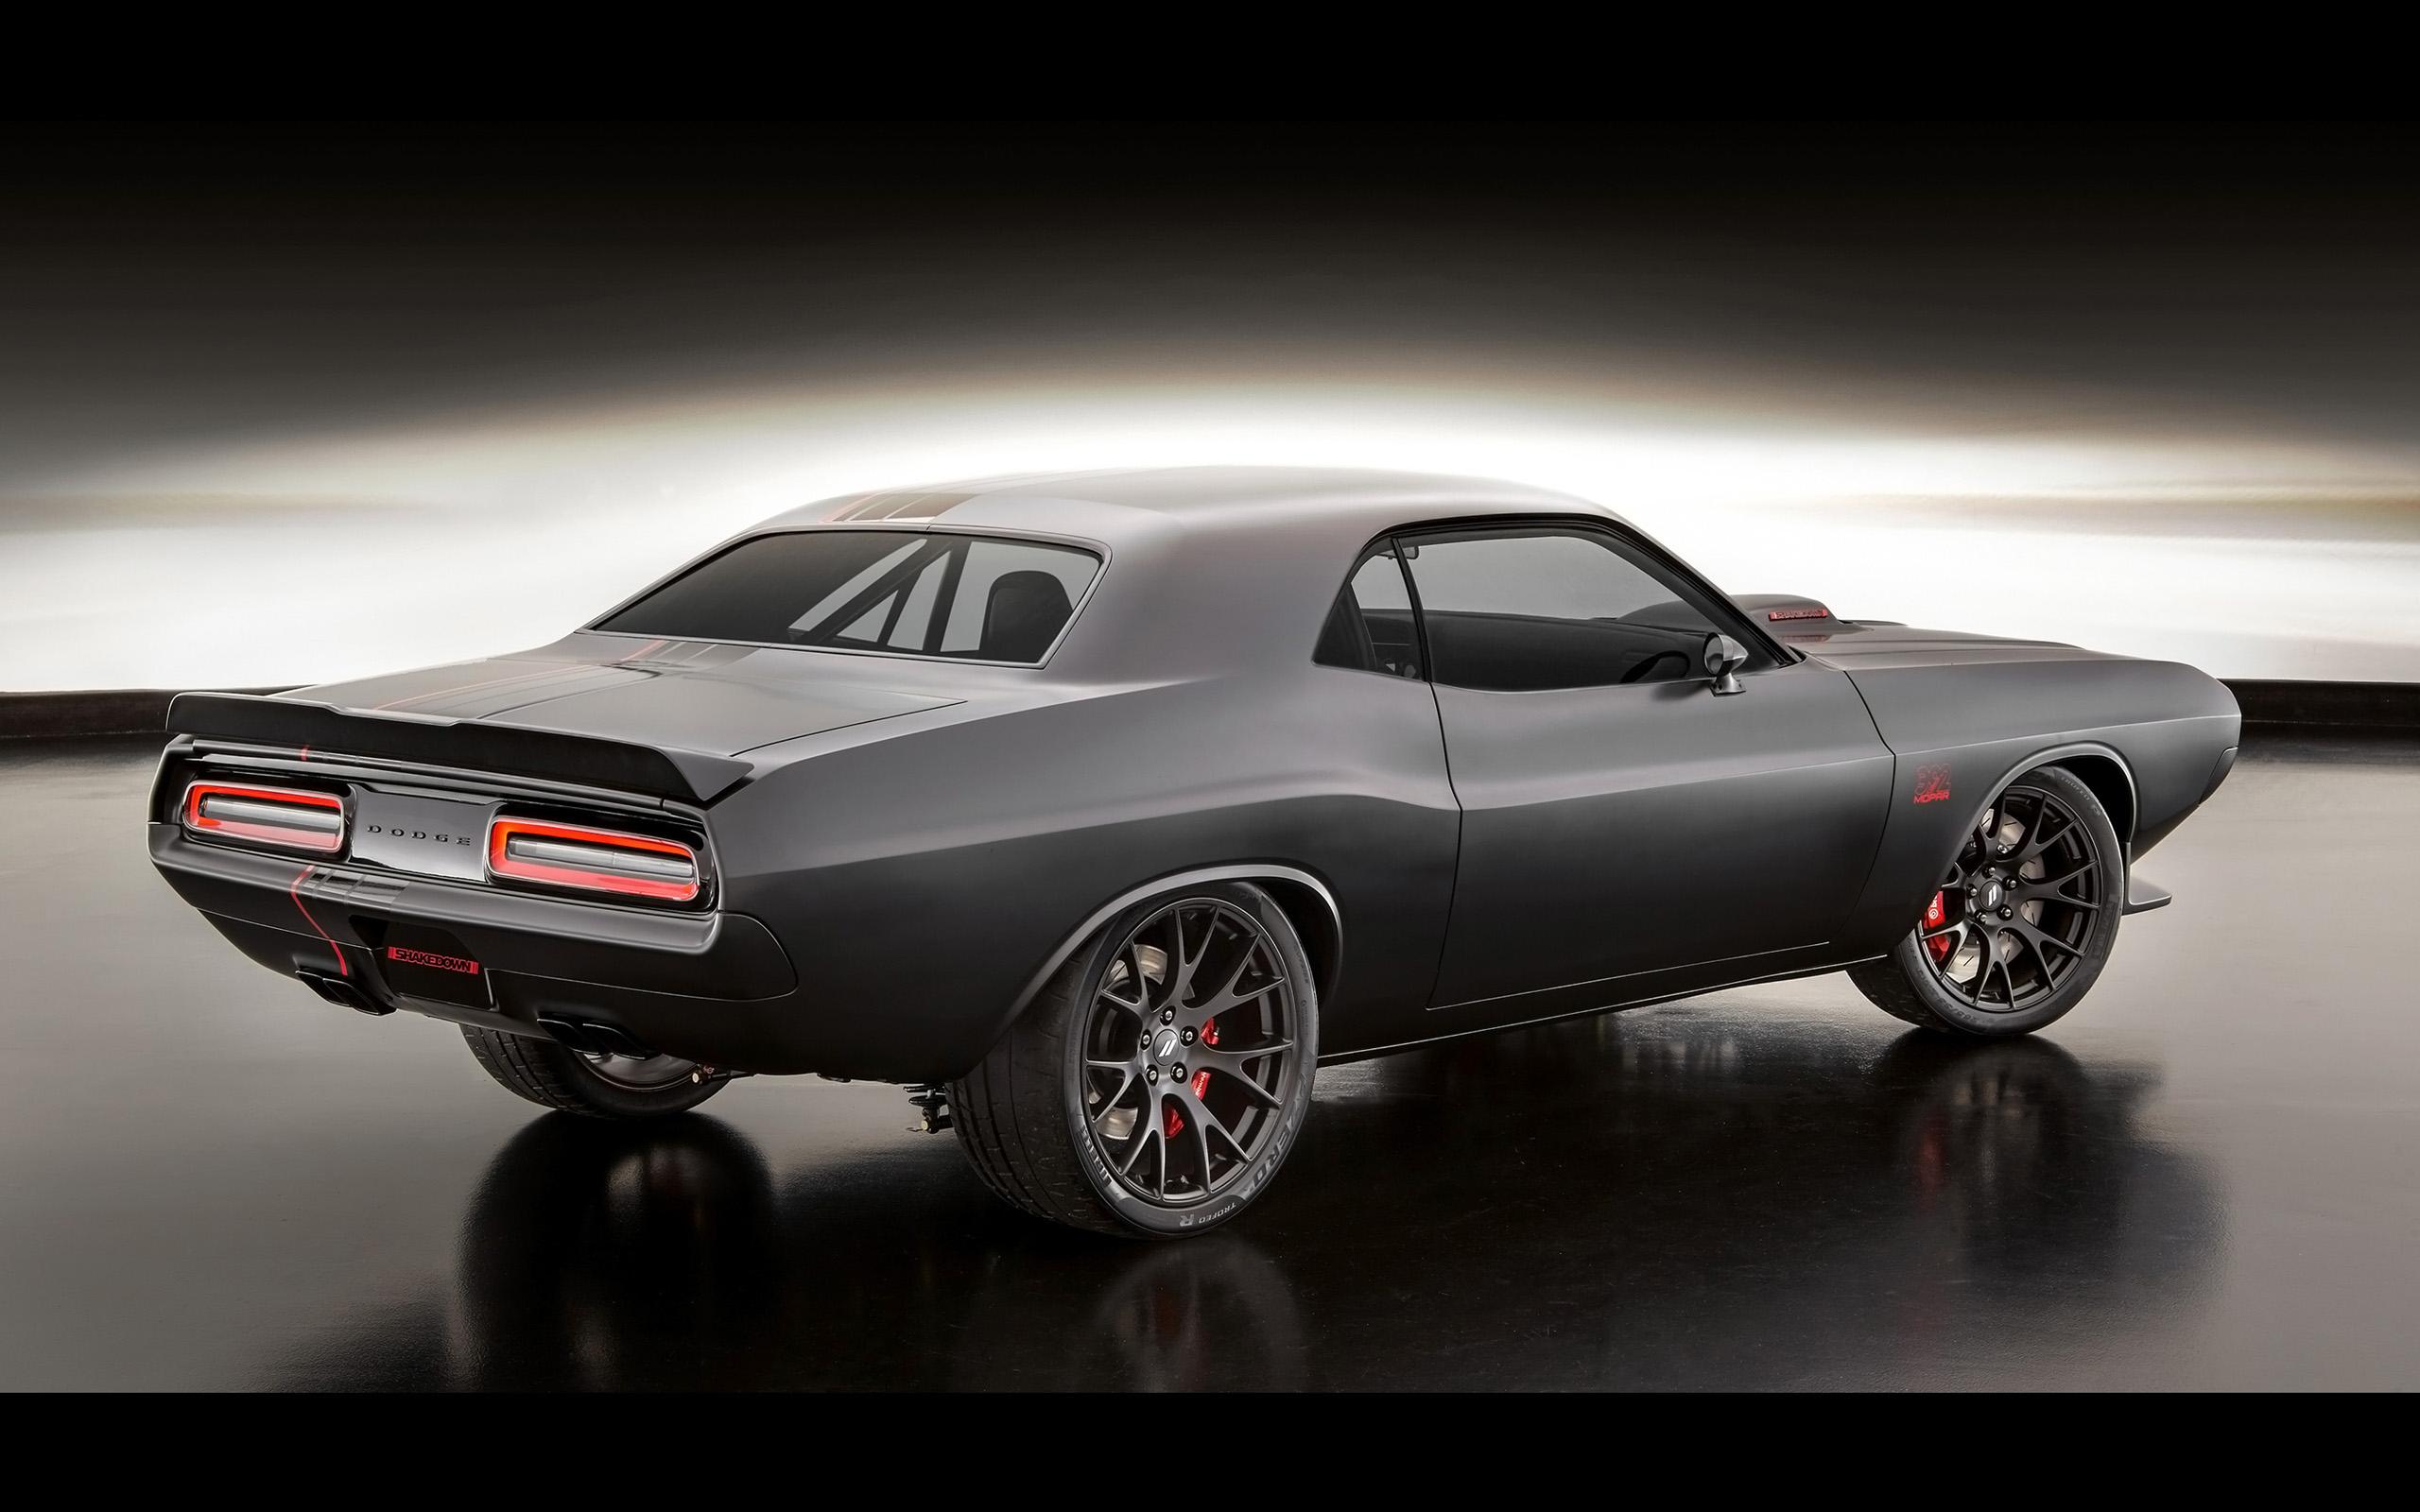 Car Dodge Dodge Challenger Dodge Shakedown Challenger Hot Rod Mopar Muscle Car Vehicle 2560x1600